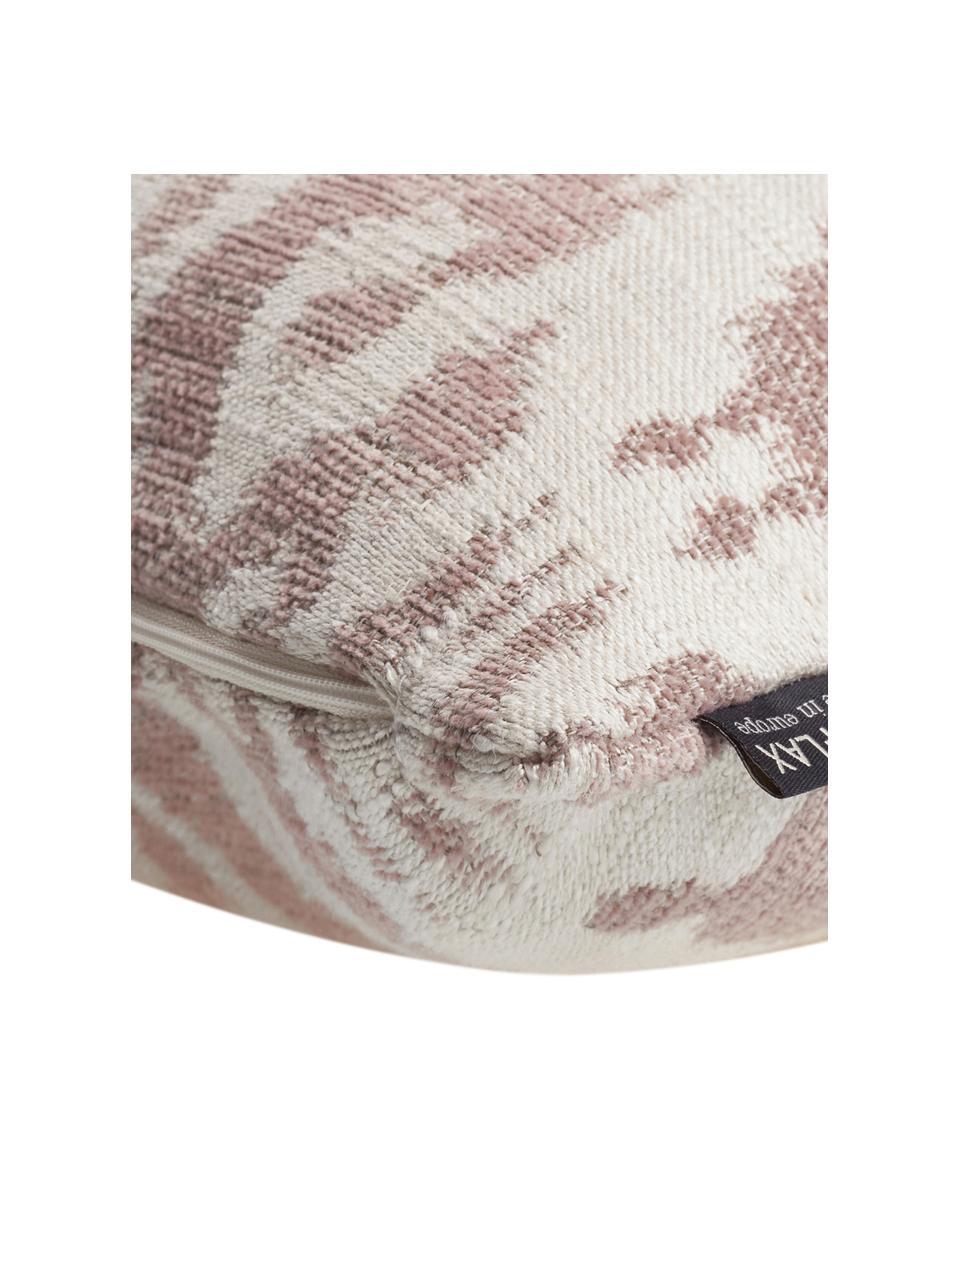 Kissenhülle Vanja in Hellrosa/Creme, 52% Polyester, 32% Viskose, 16% Leinen, Beige, Creme, 45 x 45 cm